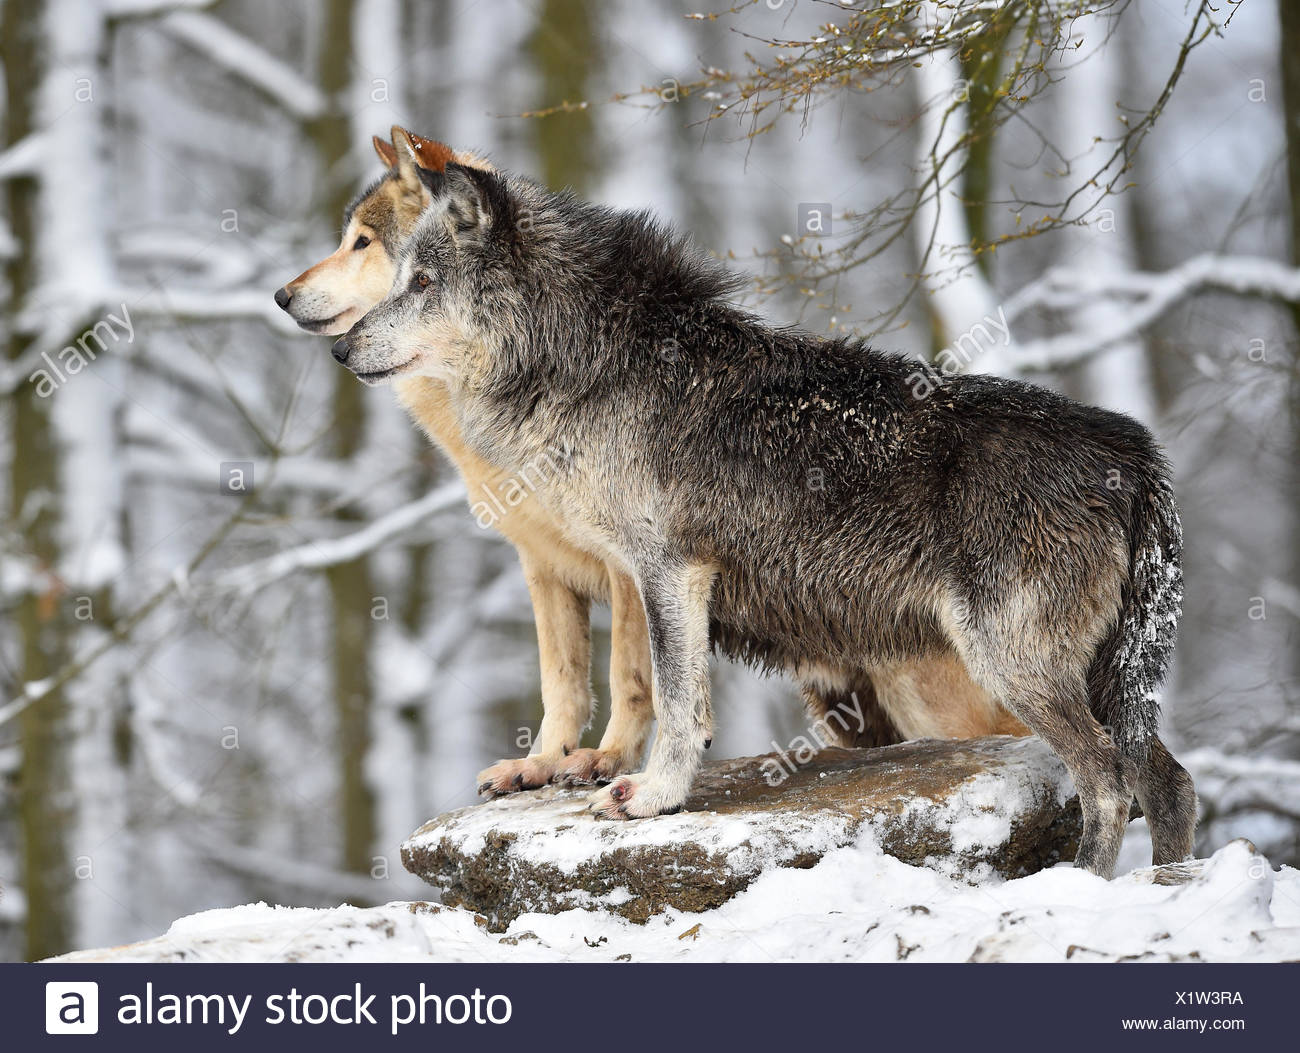 Macho y hembra alfa alfa lobo, lobo, lobo oriental, Oriental Timber Wolf (Canis lupus lycaon) en invierno, mira, cautiva Imagen De Stock